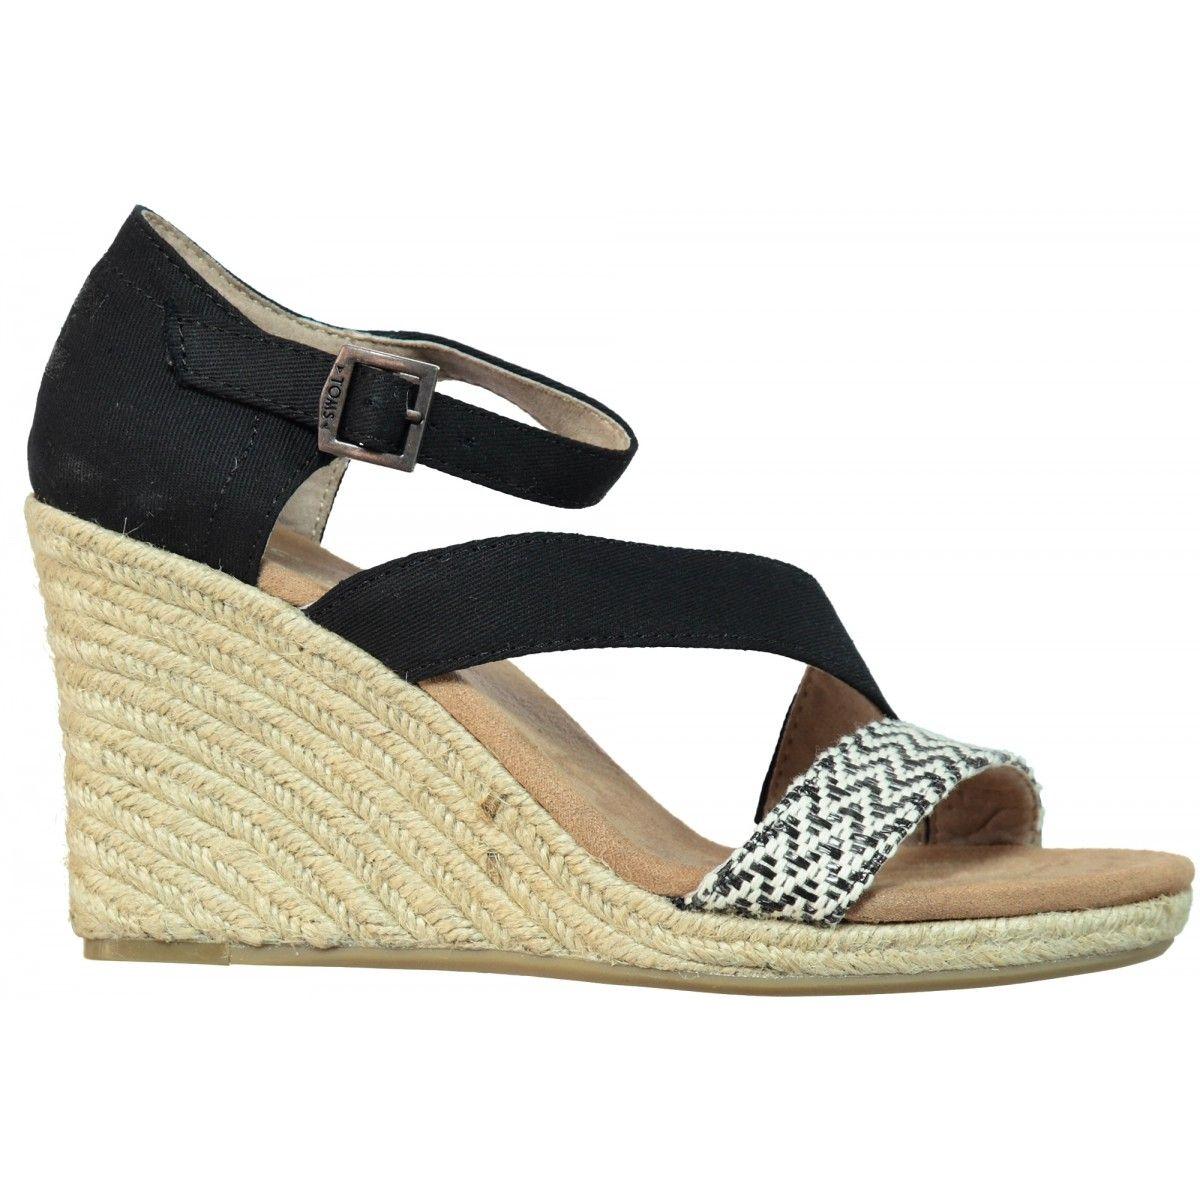 Toms Chaussures Femmes Wedge FPSbHSDcHn